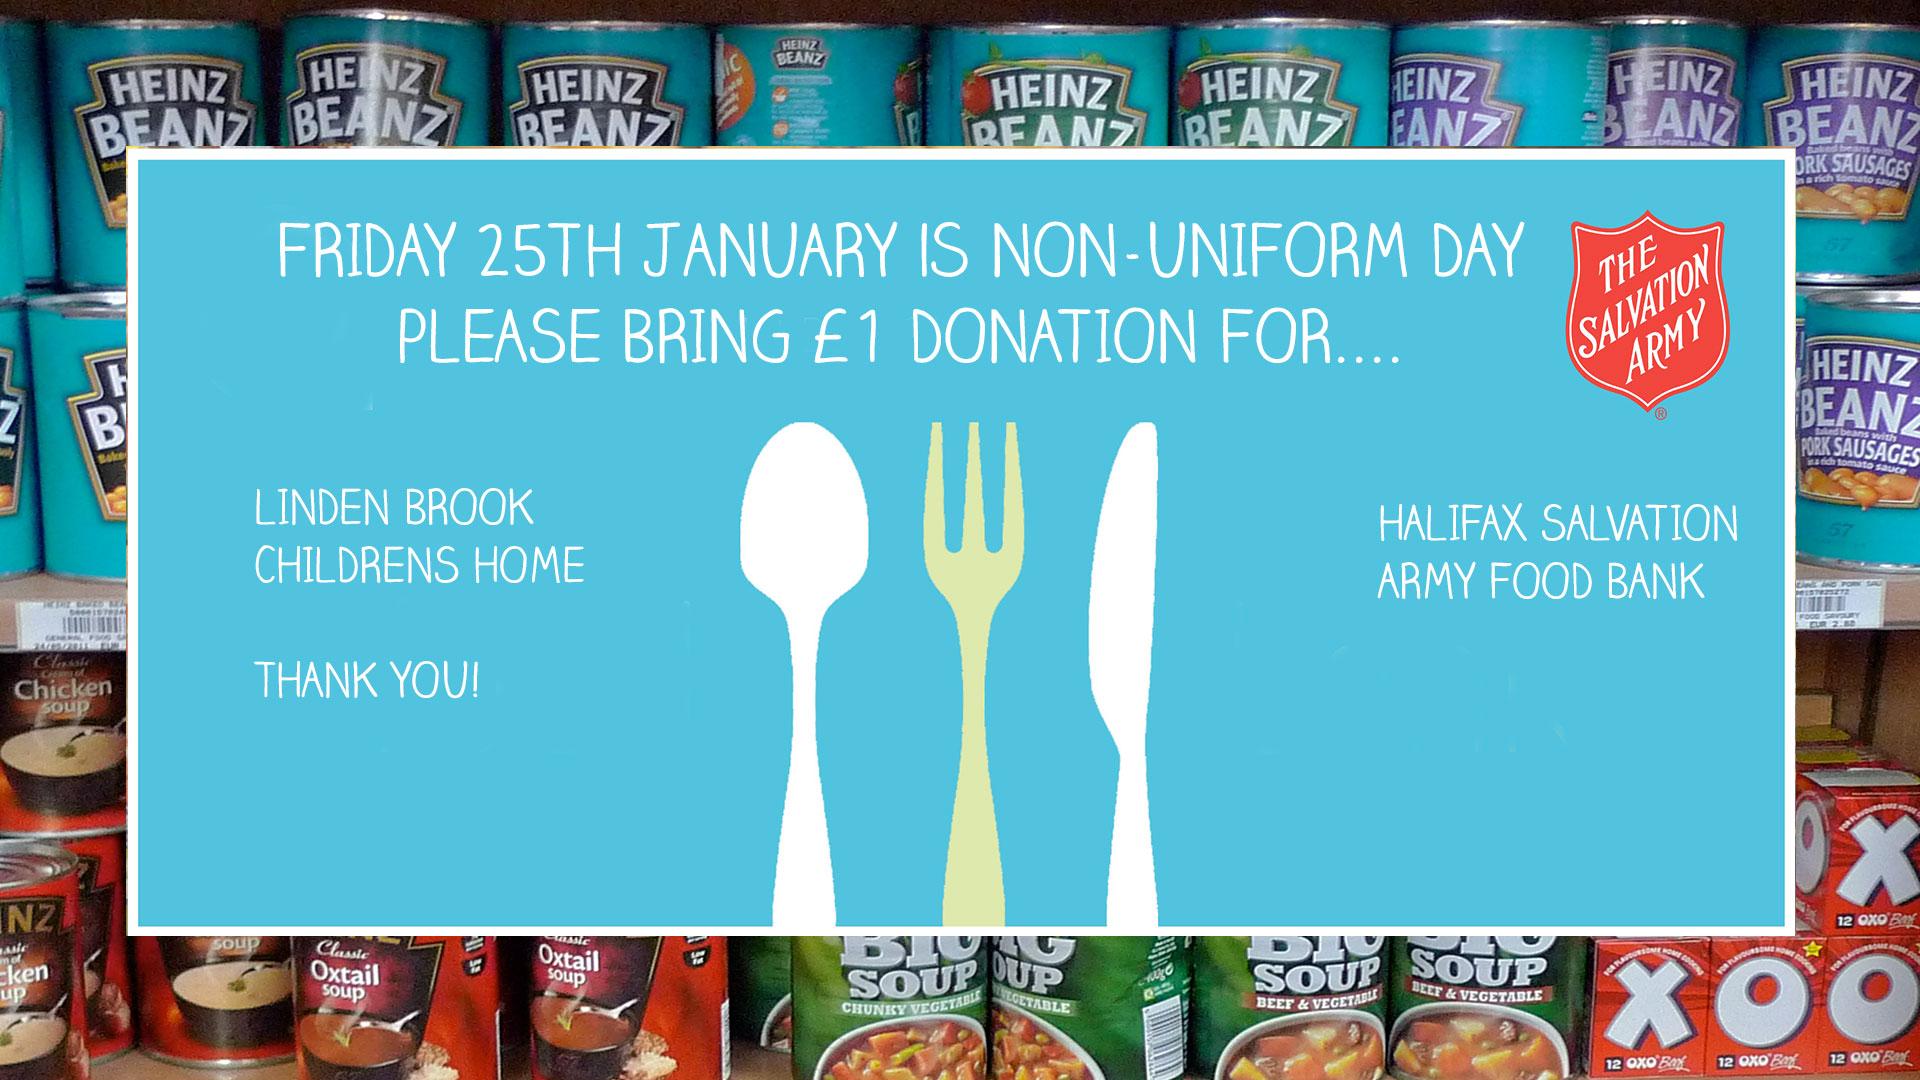 Friday 25th January Non-Uniform day